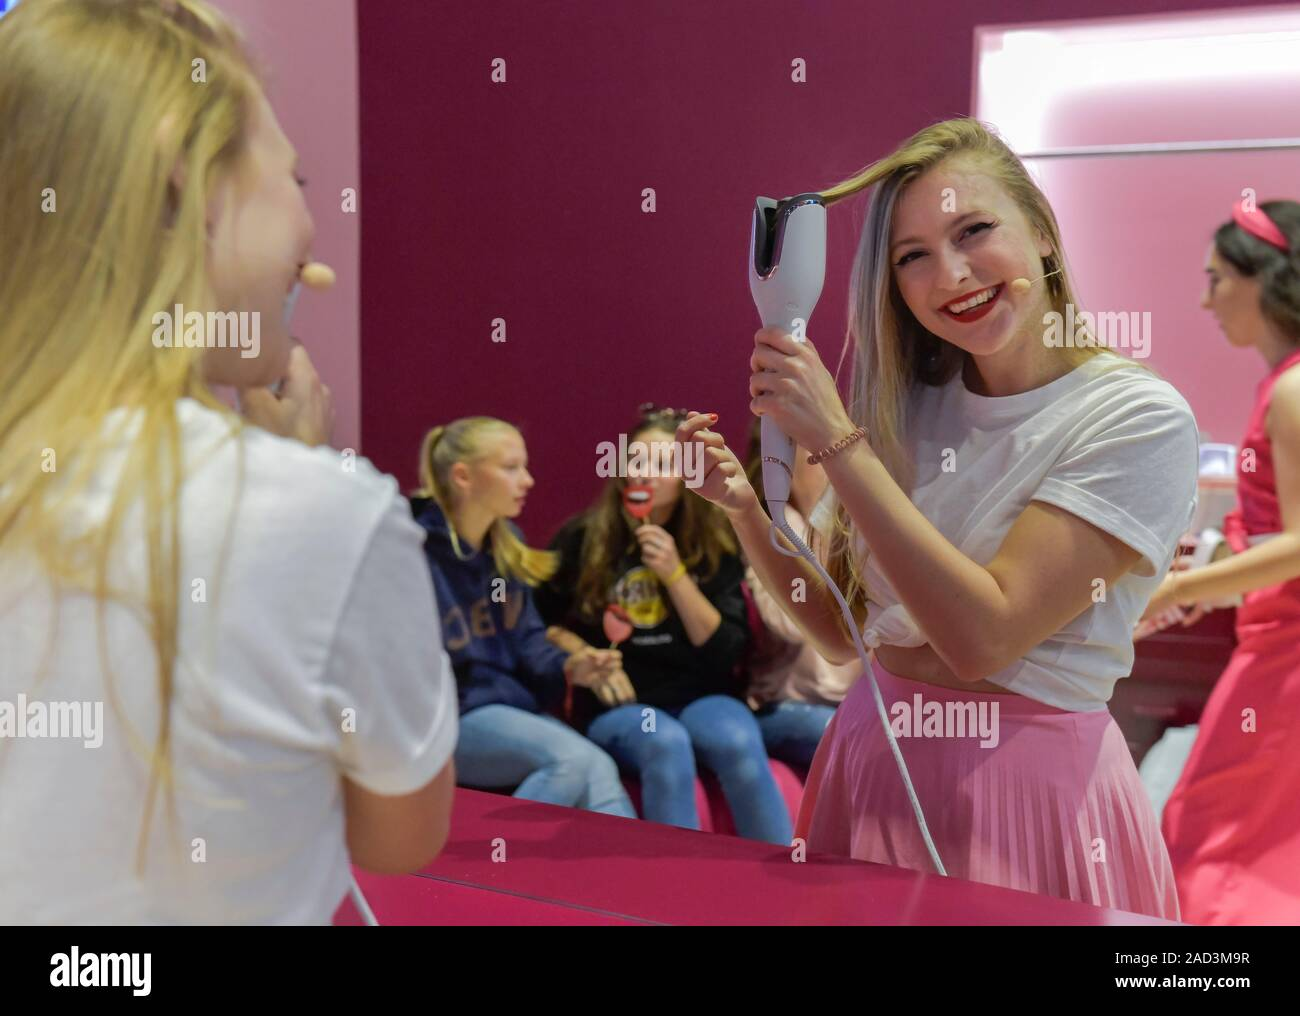 Lockenstab, Philips, Elektronik, Internationale Funkaustellung, Berlin 2019, Deutschland Stock Photo